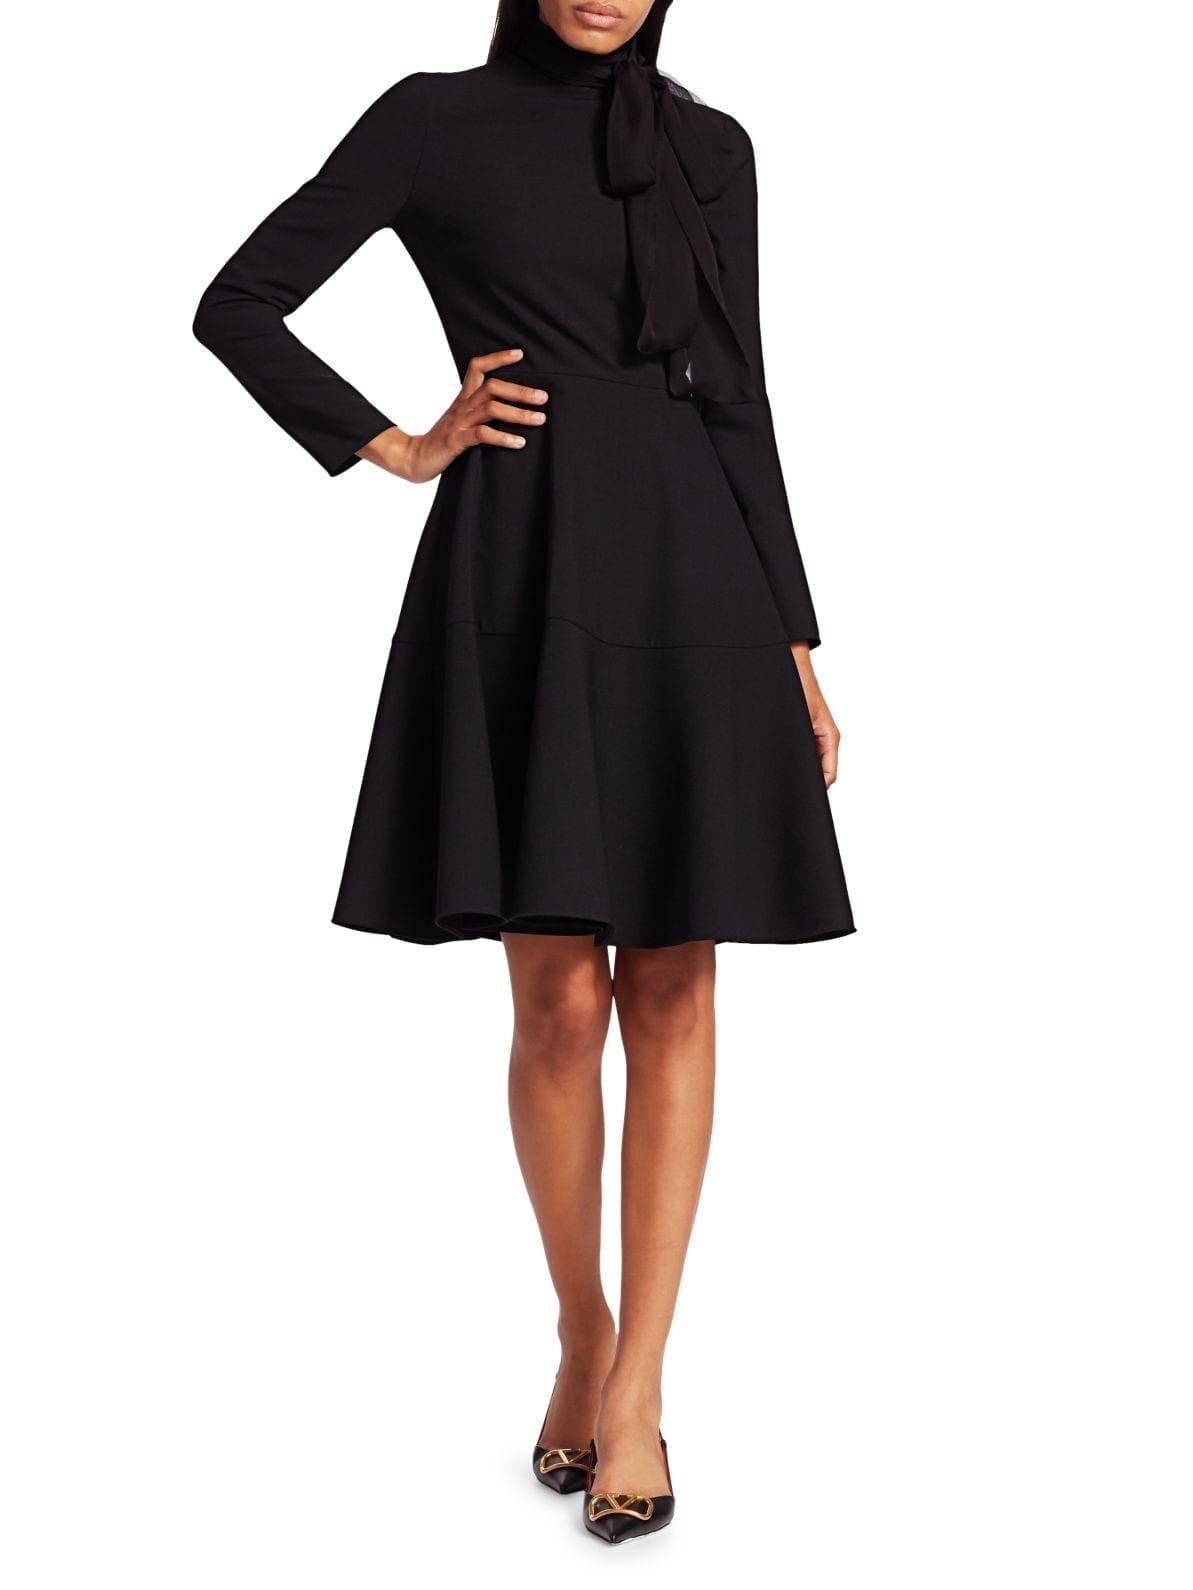 VALENTINO Techno Tieneck Wool-Blend Fit-&-Flare Dress